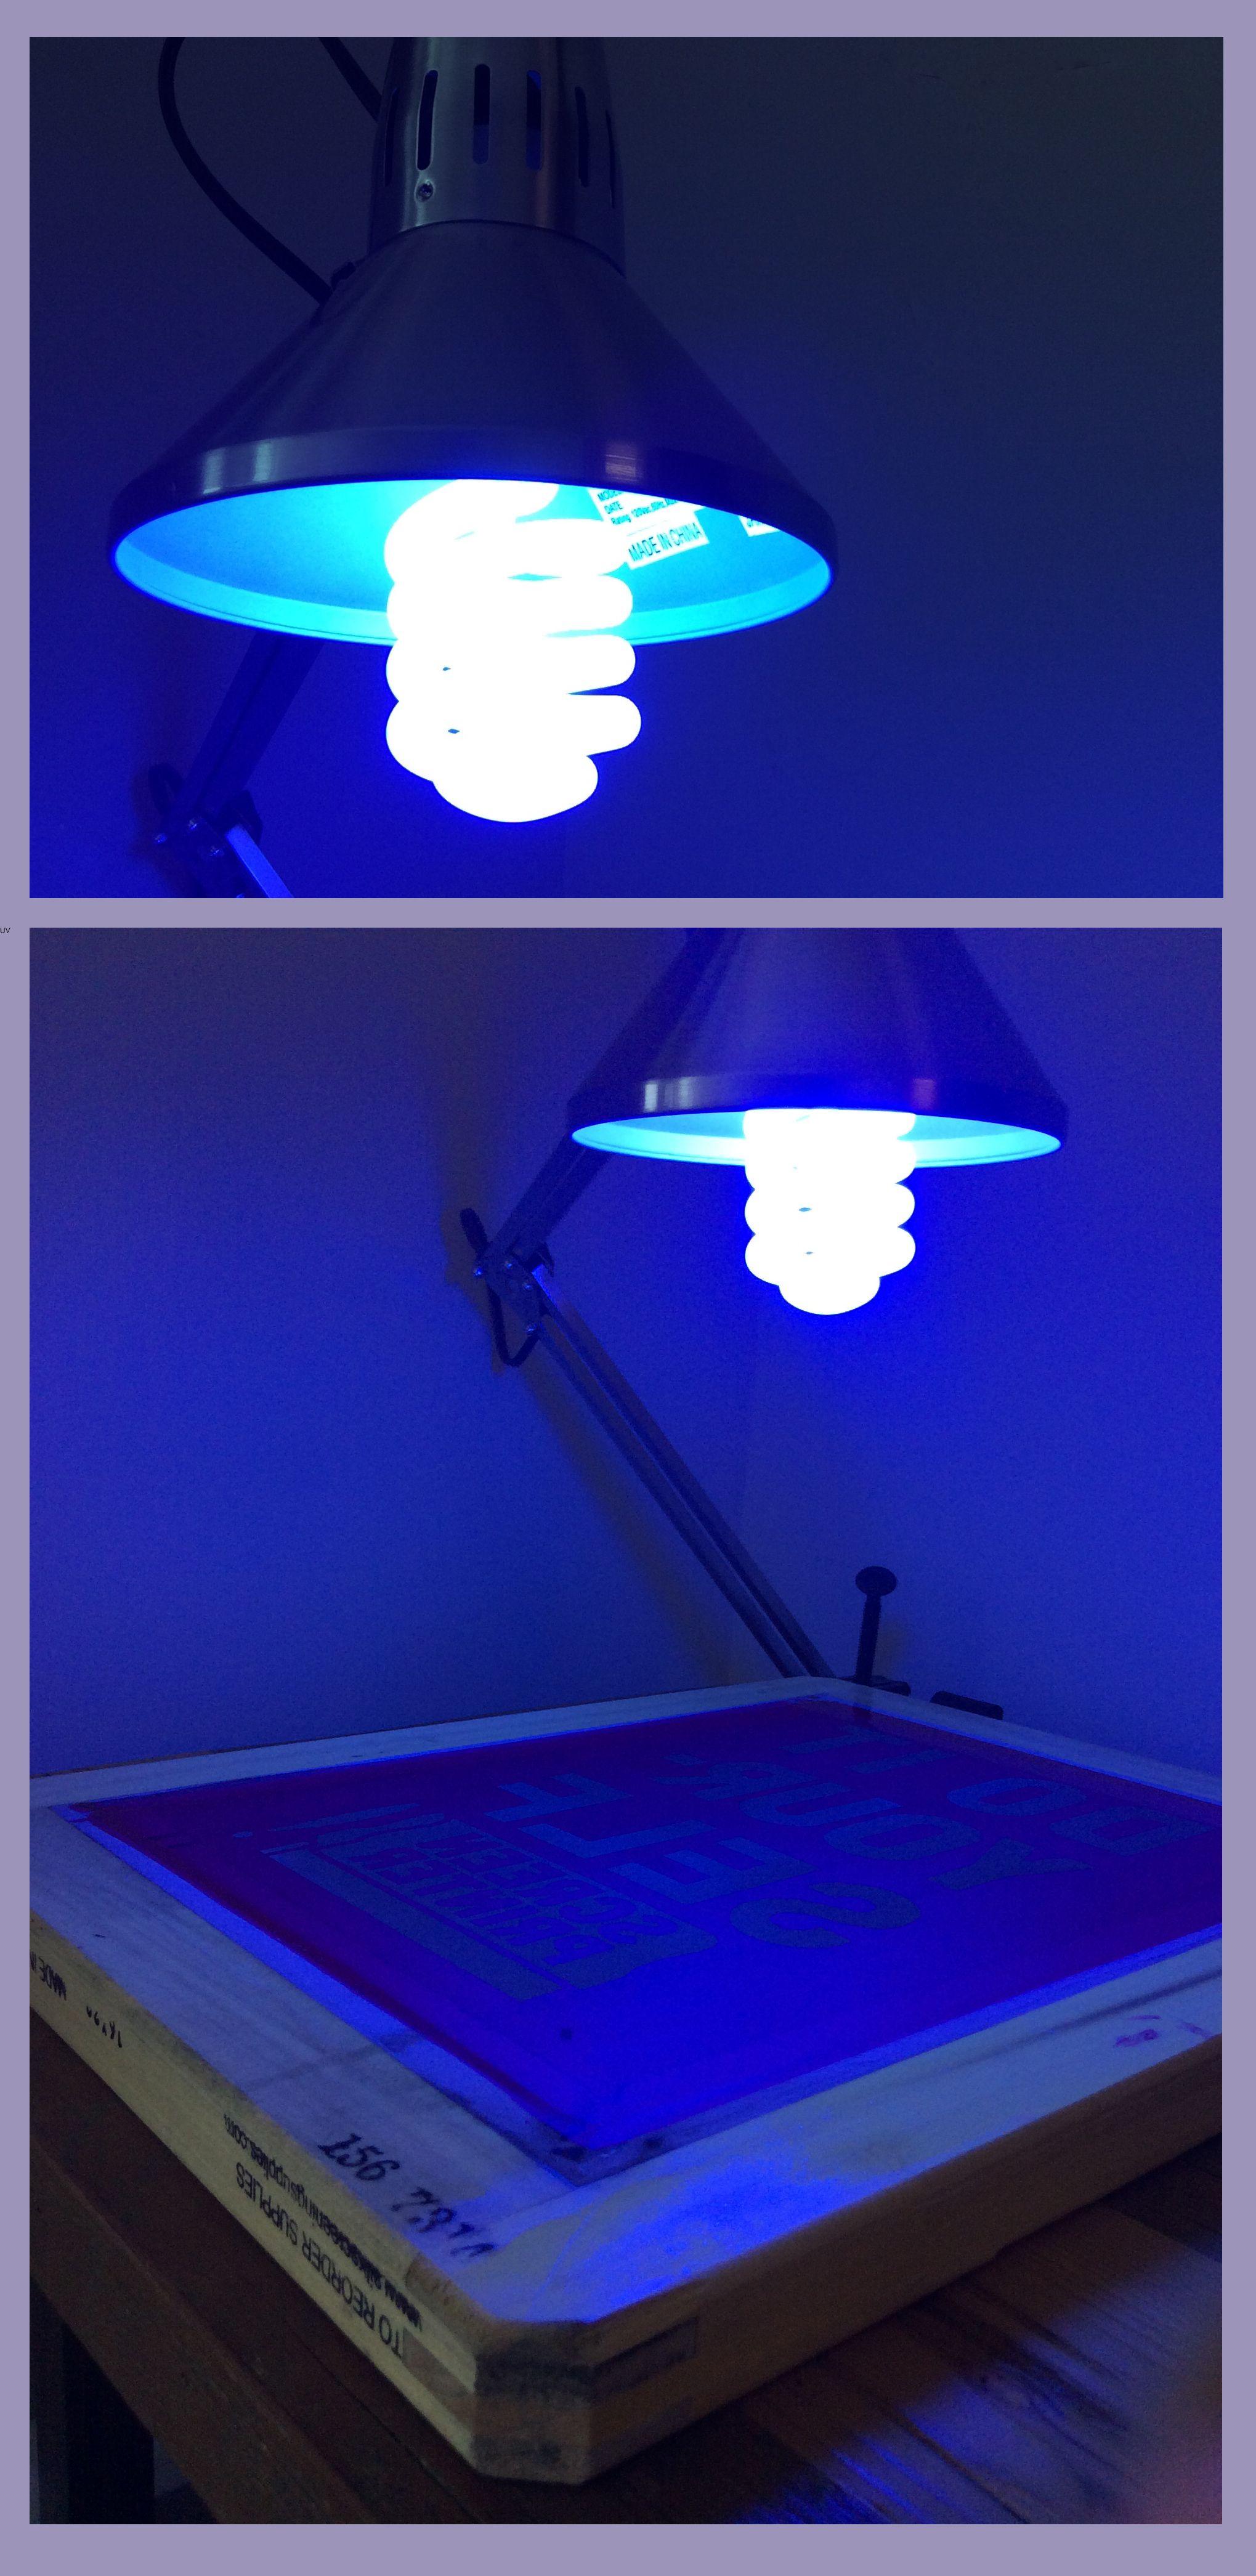 Diy uv screen exposure bulb diy screen printing screen